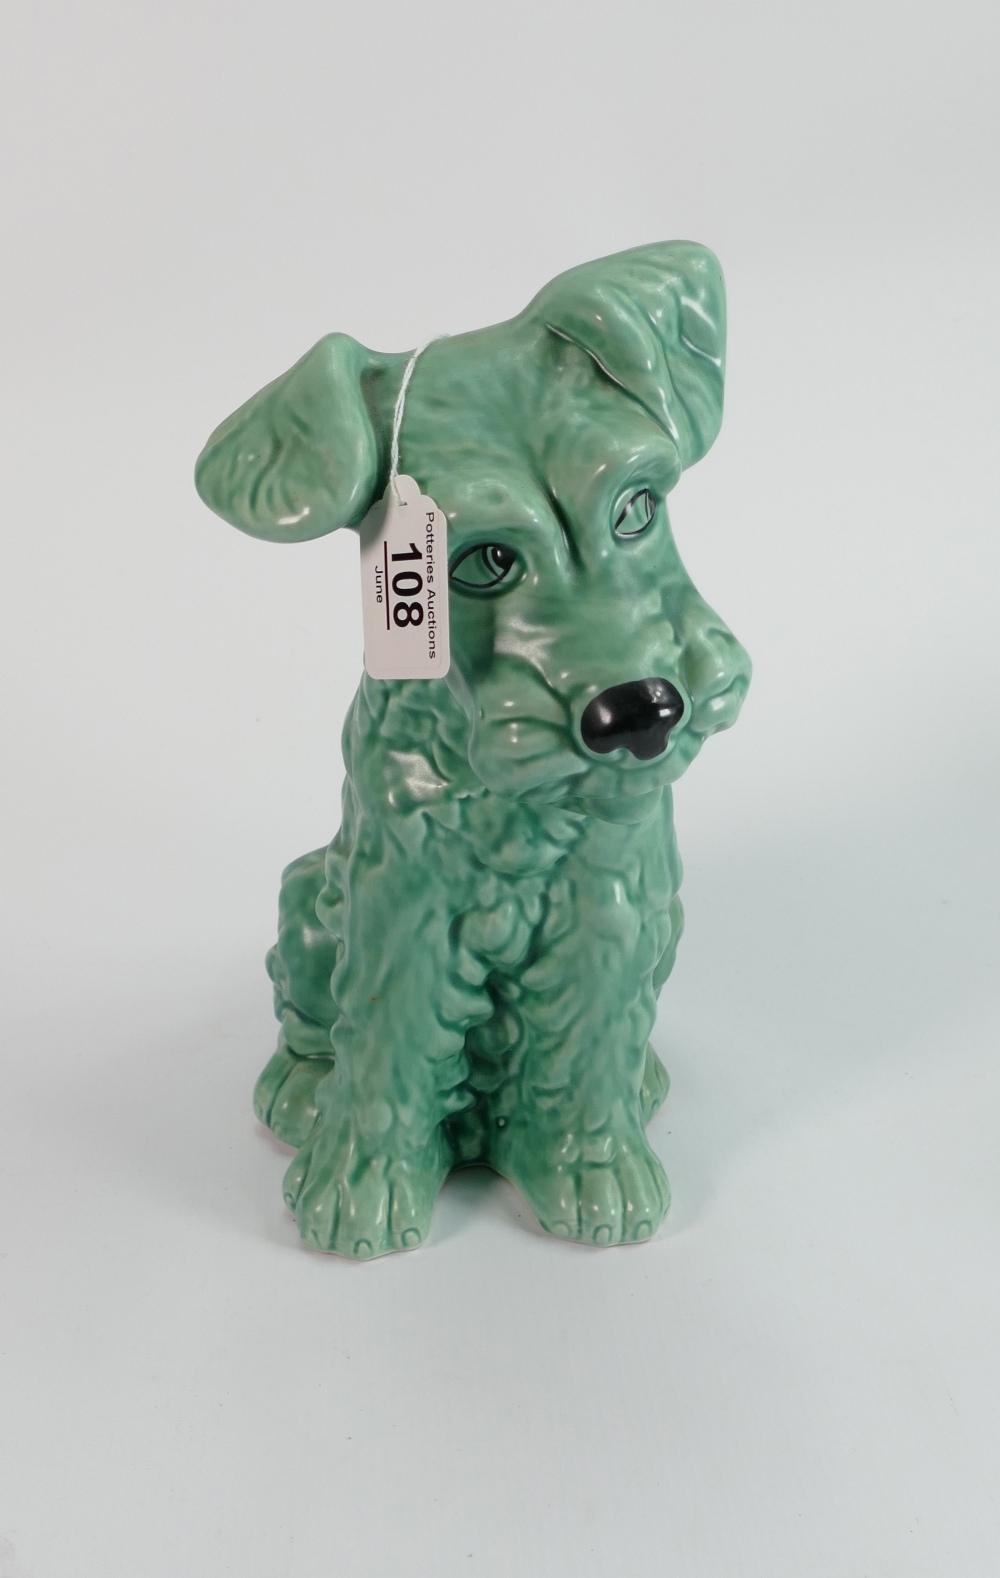 Large green Sylvac dog ref 1380: 29 cm high.